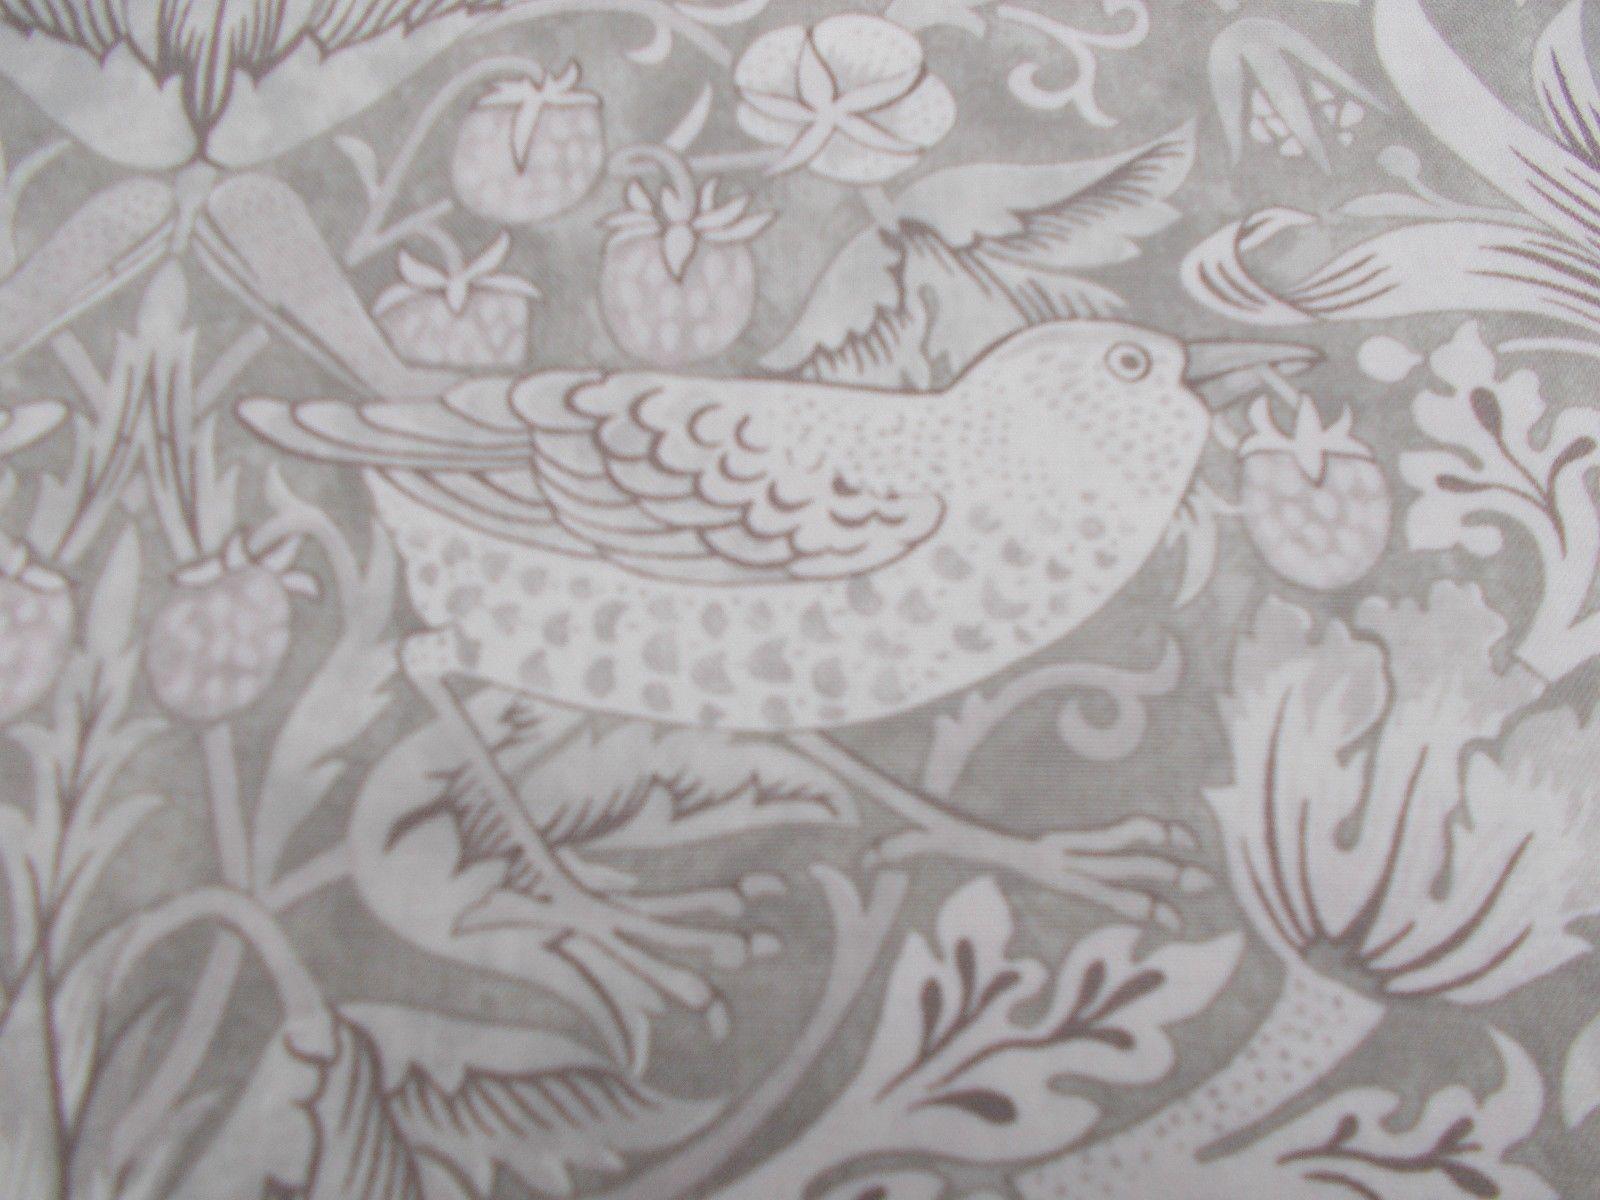 William Morris Curtain Fabric 'Strawberry Thief' 3.5 METRES (350cm) Neutral GBP 108.99